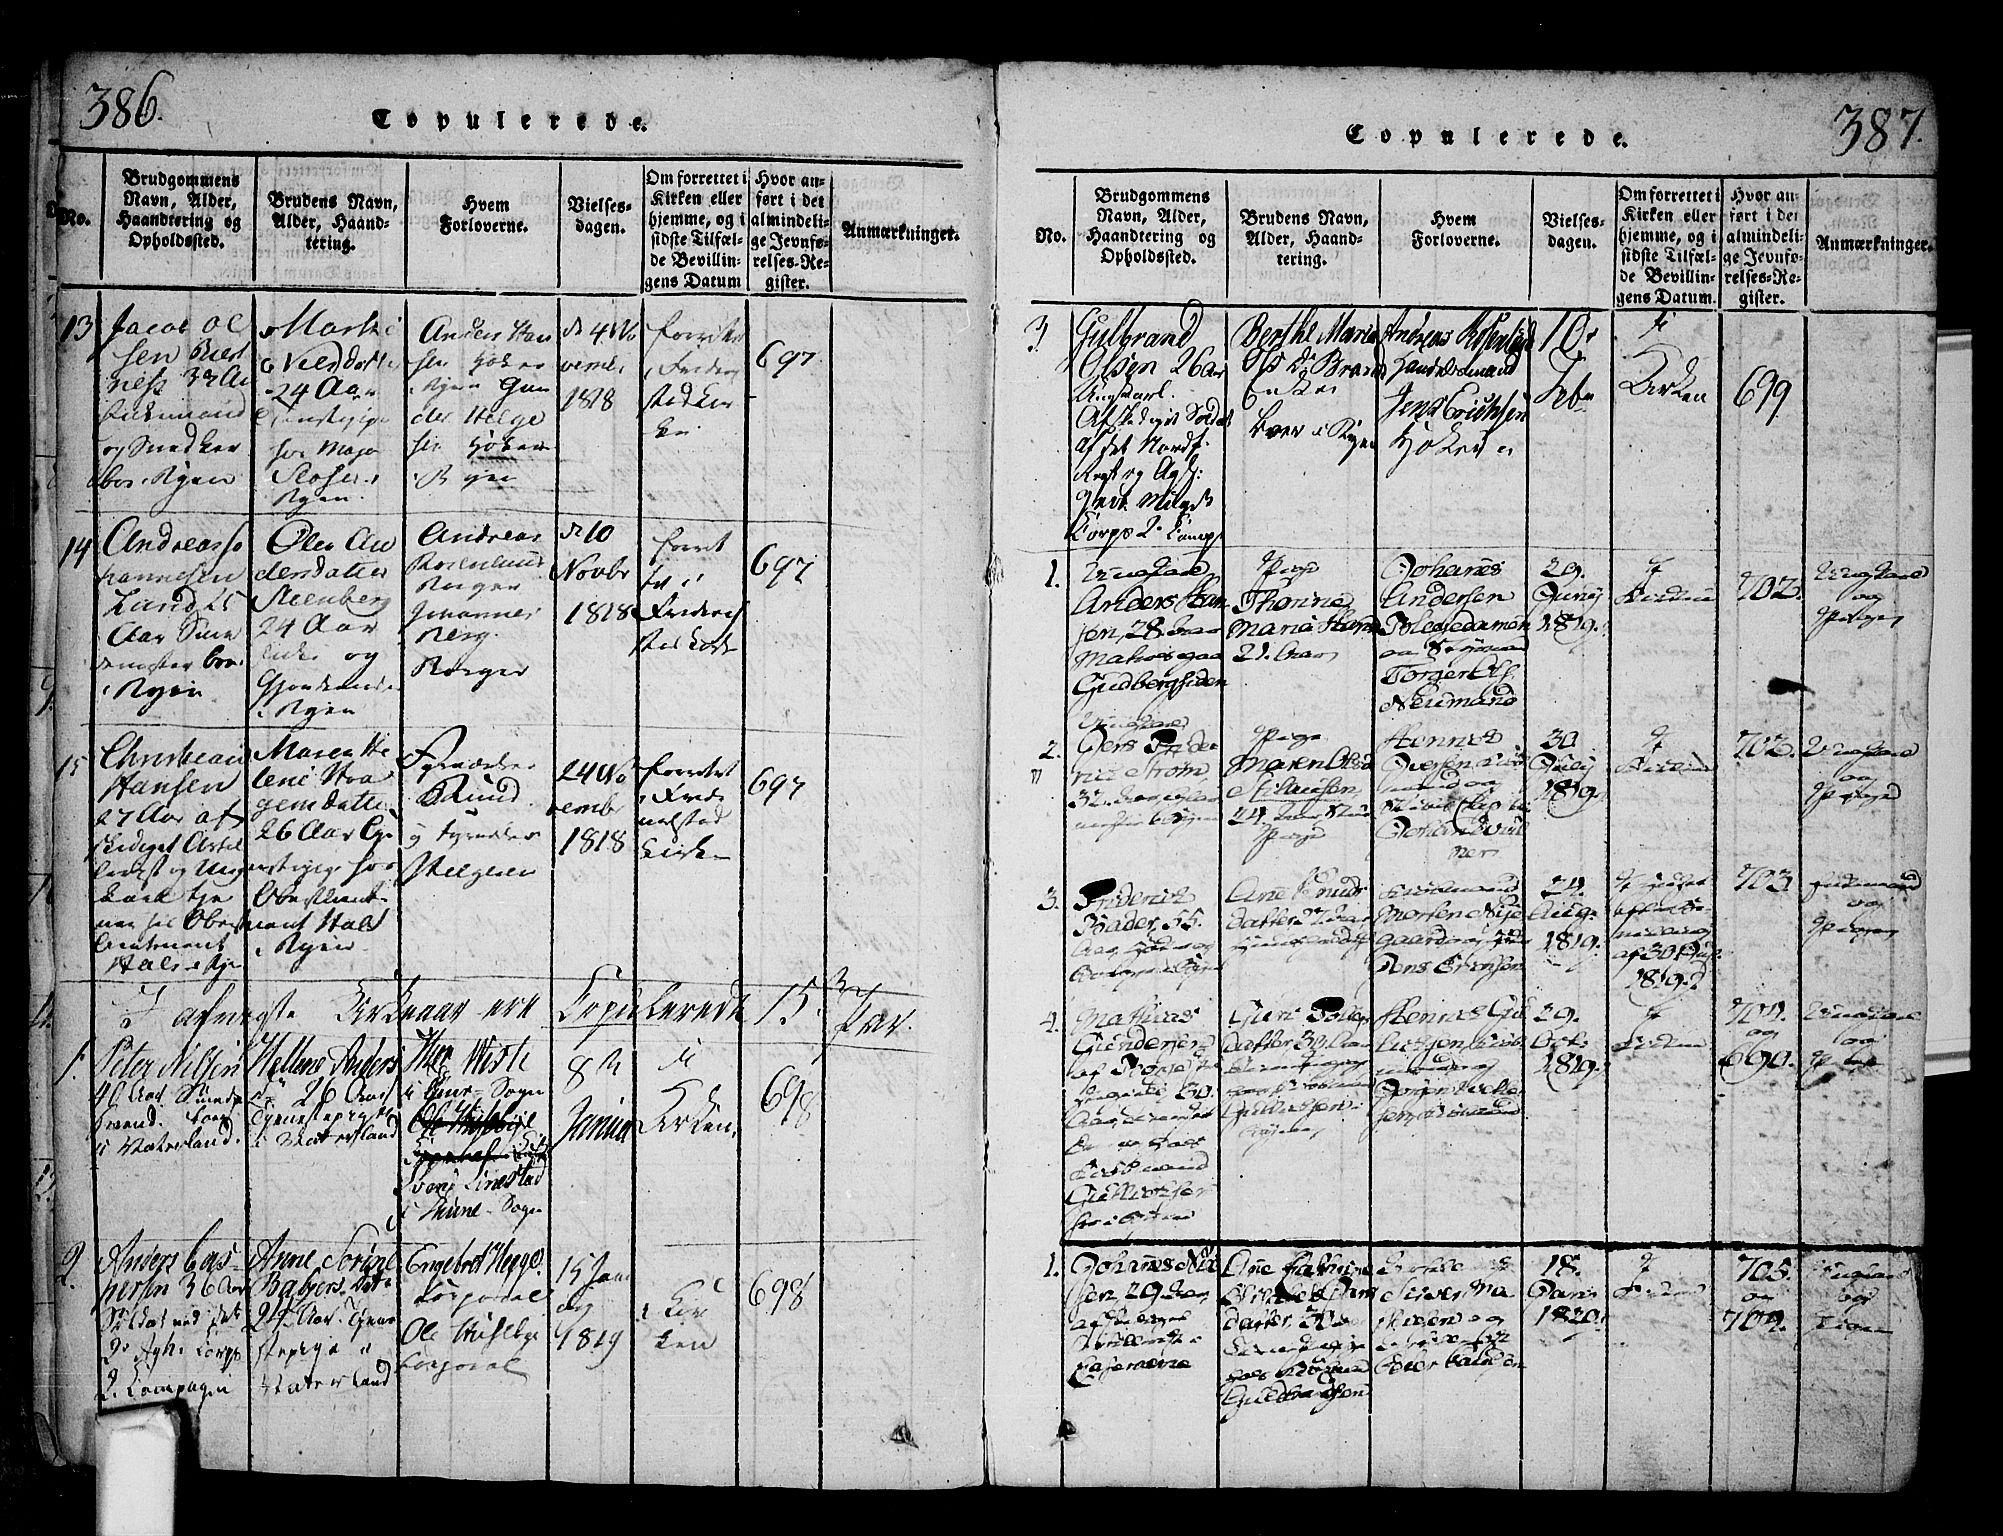 SAO, Fredrikstad prestekontor Kirkebøker, F/Fa/L0004: Parish register (official) no. 4, 1816-1834, p. 386-387